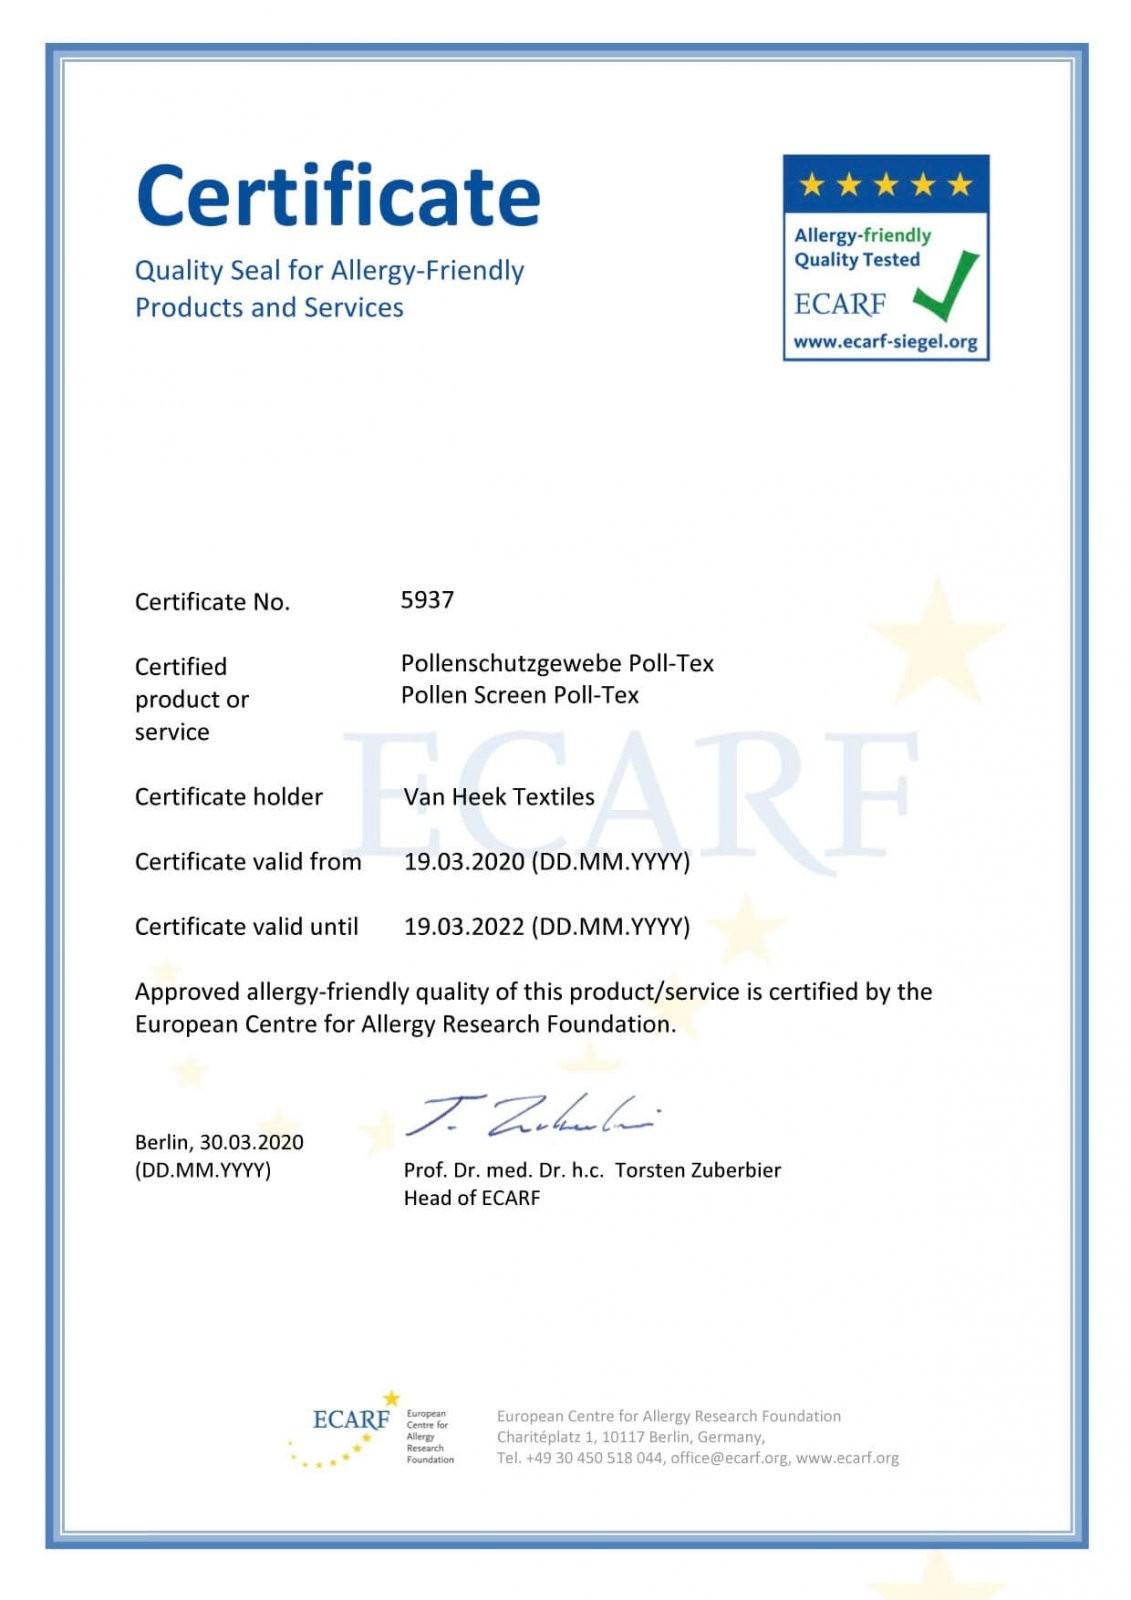 Poll-tex®防霾紗窗獲得歐盟ECARF(過敏研究基金會)認證